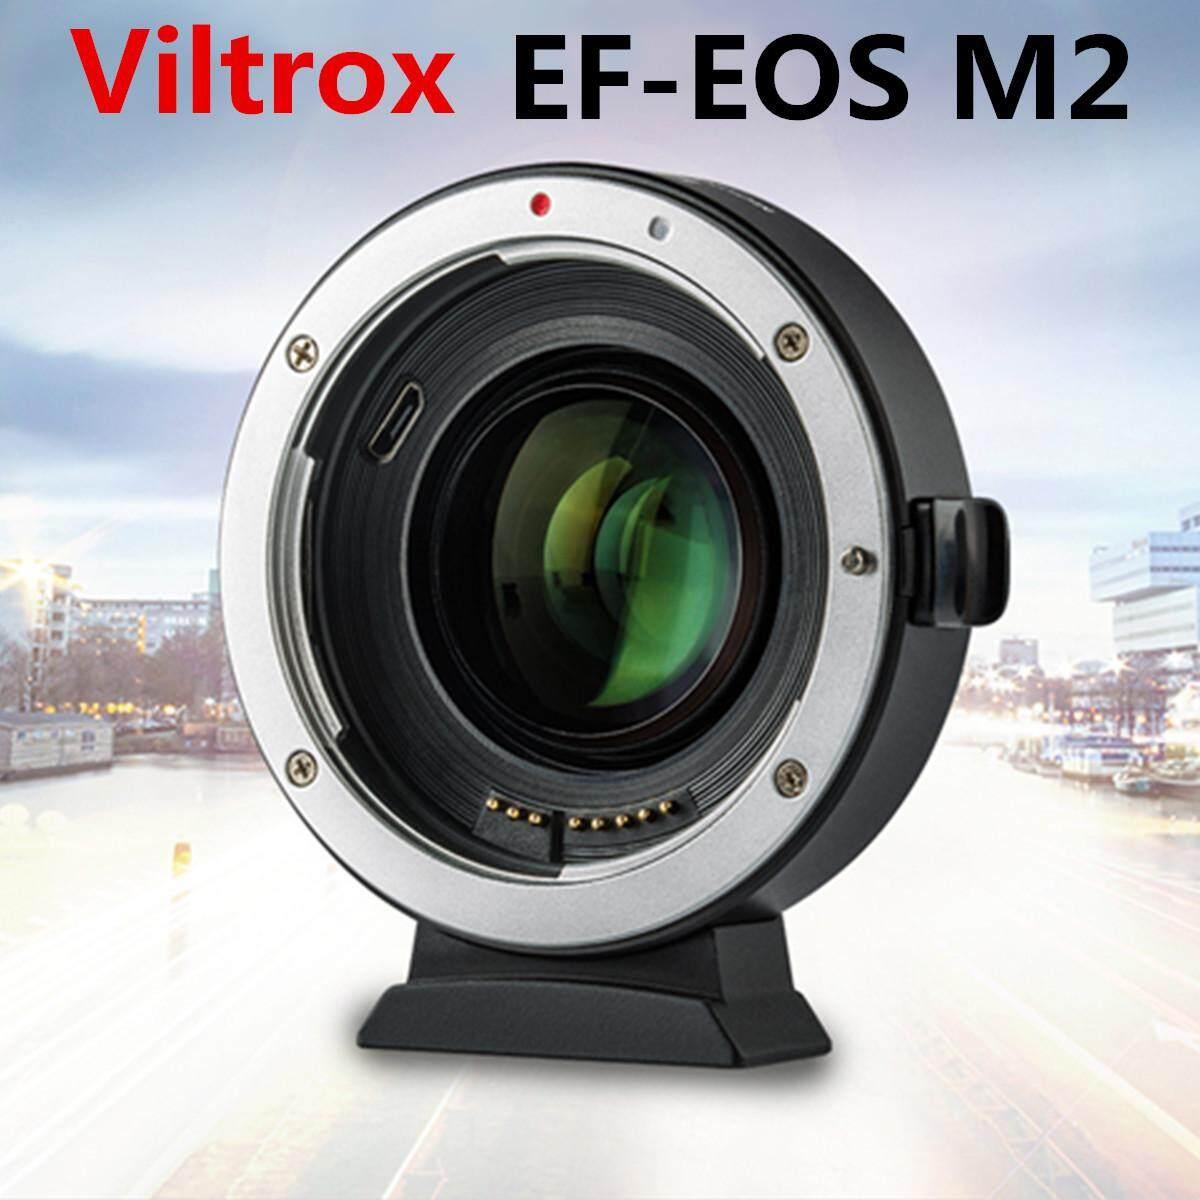 VILTROX EF-EOS M2 VILTROX EF-EOS M2 Auto Focus อะแดปเตอร์เลนส์ 0.71X สำหรับ Canon EF เลนส์ EOS-M50 M10